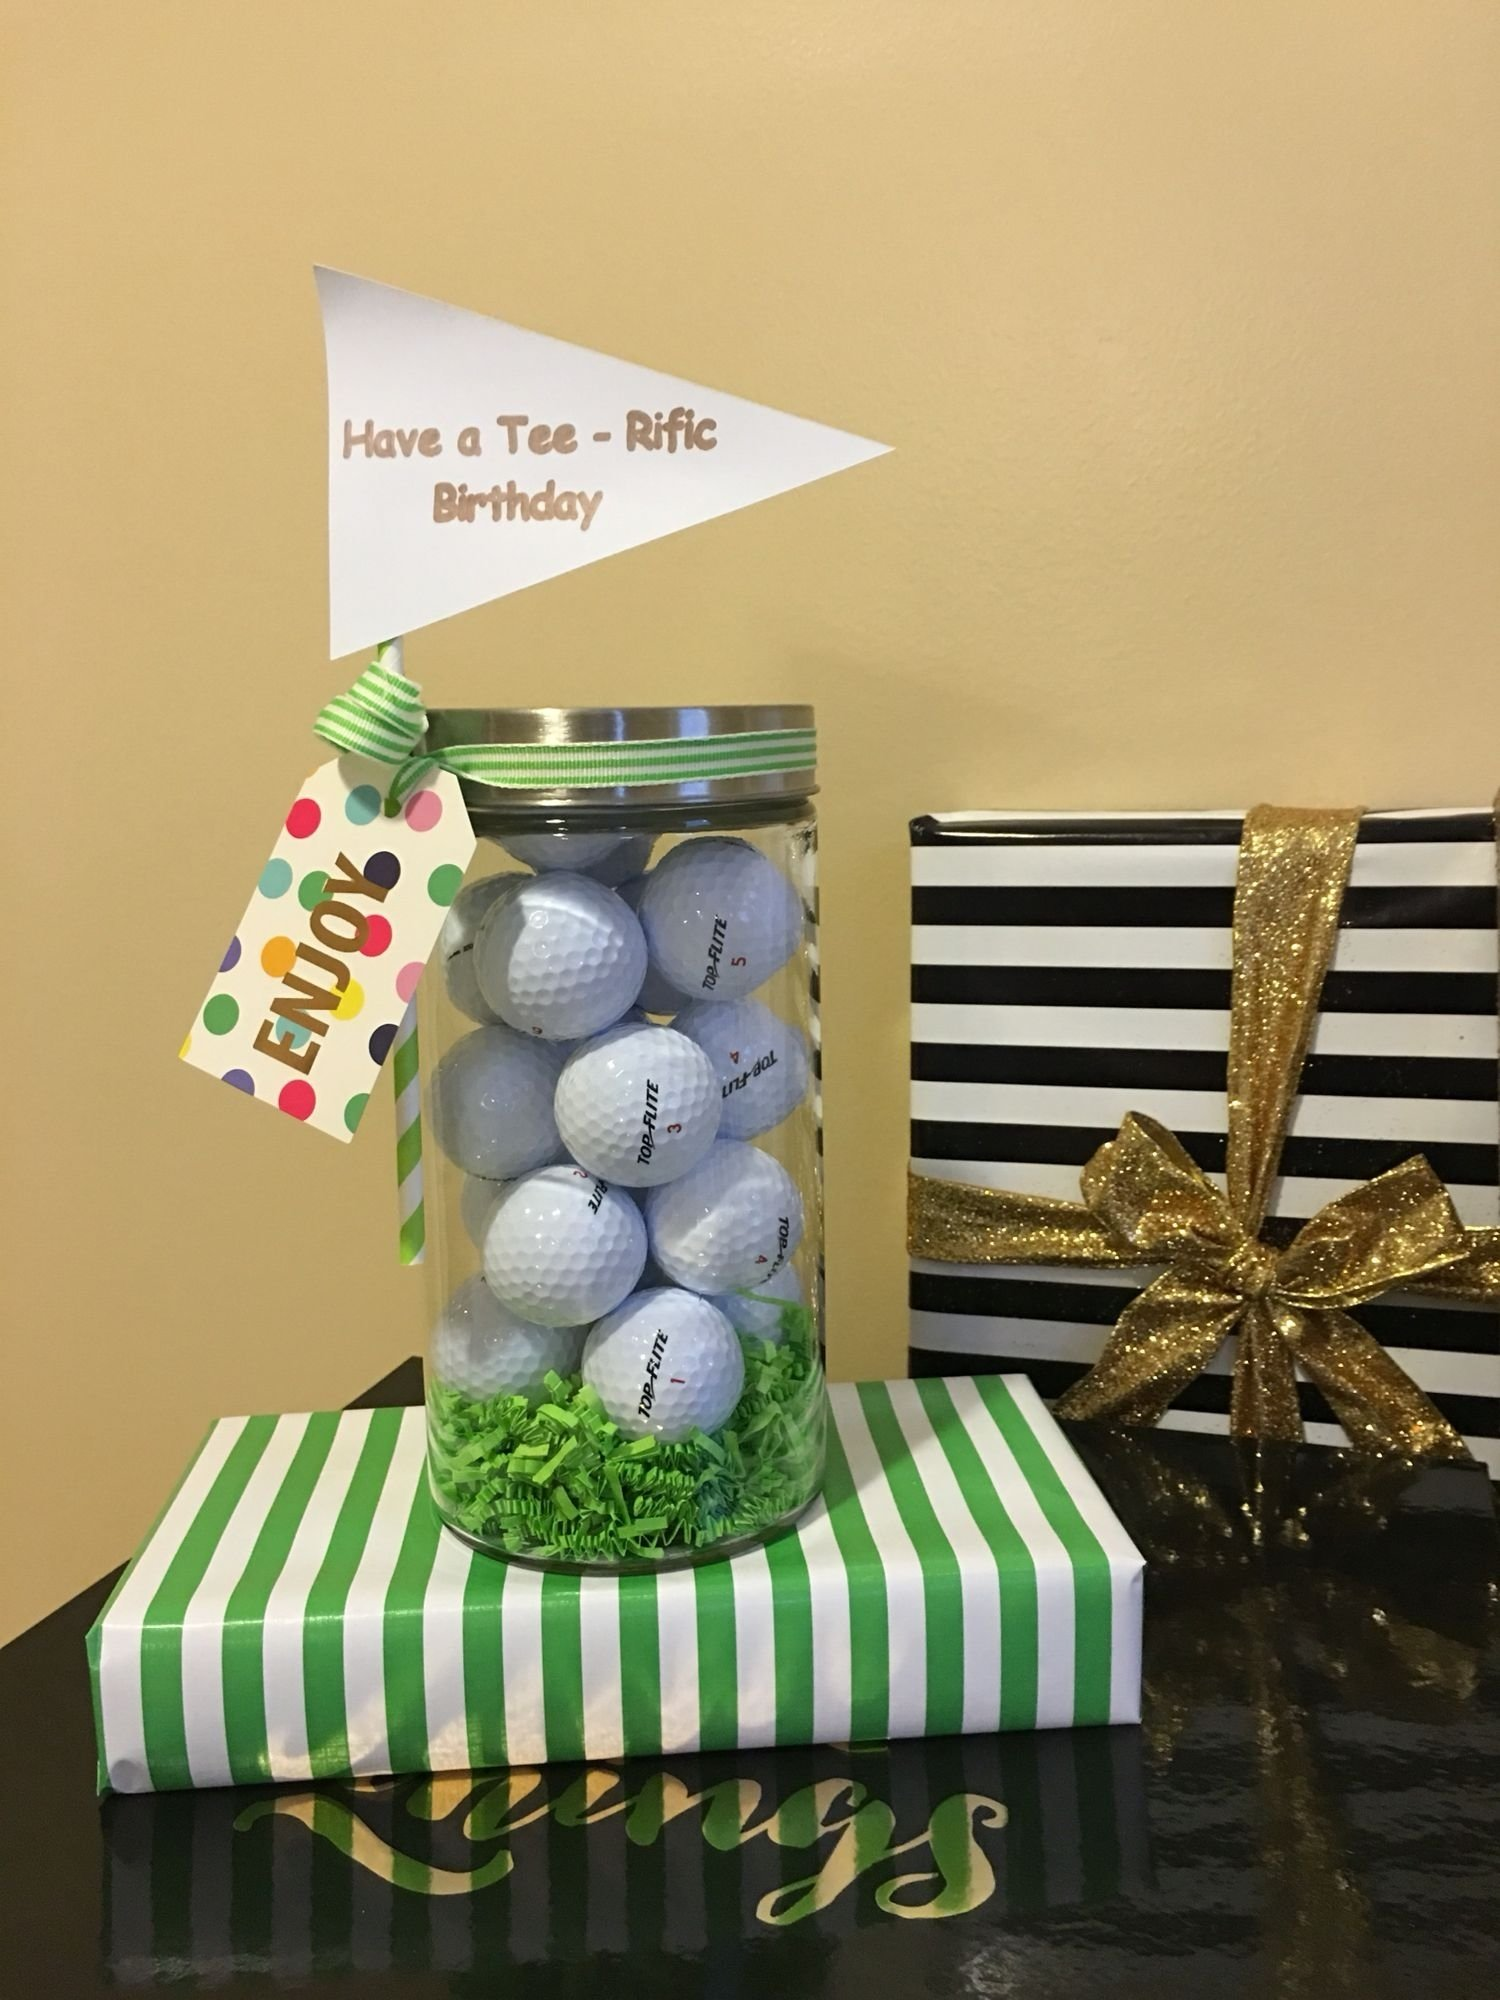 10 Elegant Golf Gift Ideas For Dad birthday gift for a golfer cricut pinterest birthday gifts